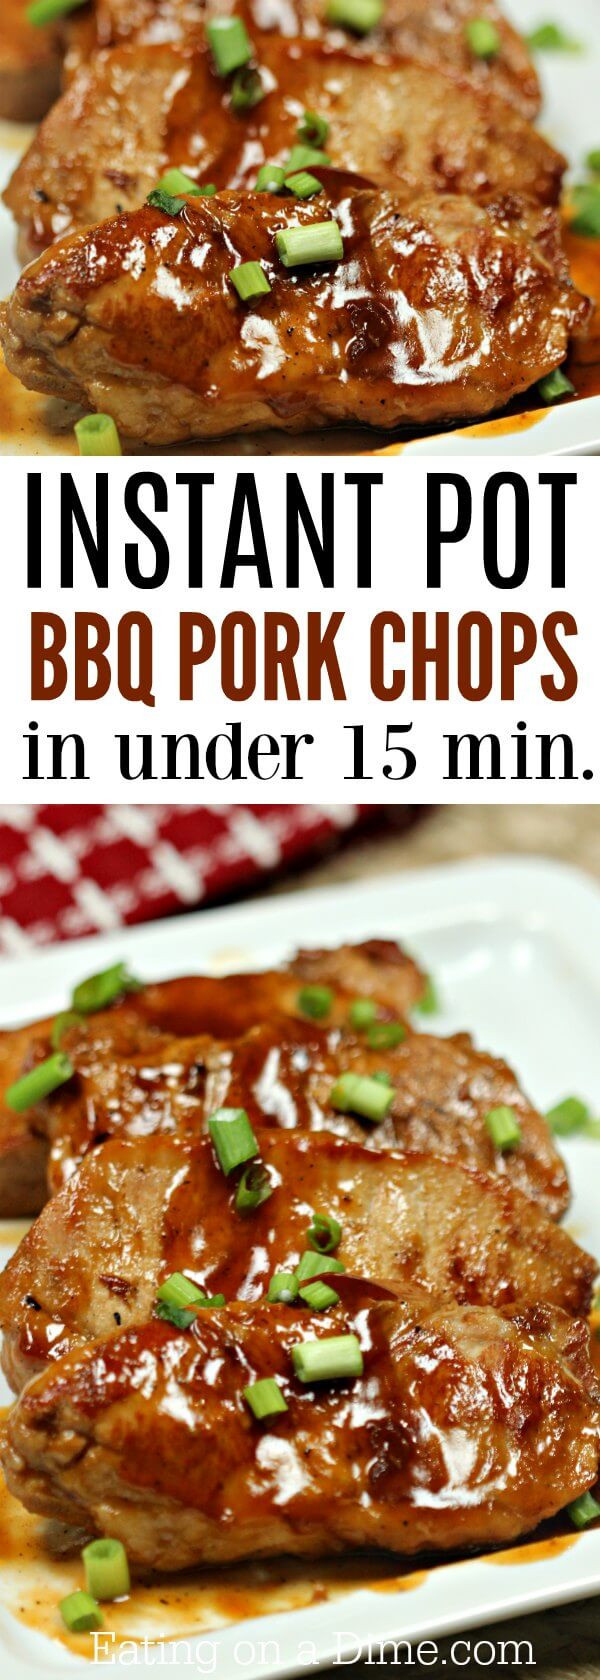 Instant Pot Boneless Pork Chops  Instant Pot BBQ Pork Chops Recipe Easy Dinner Idea